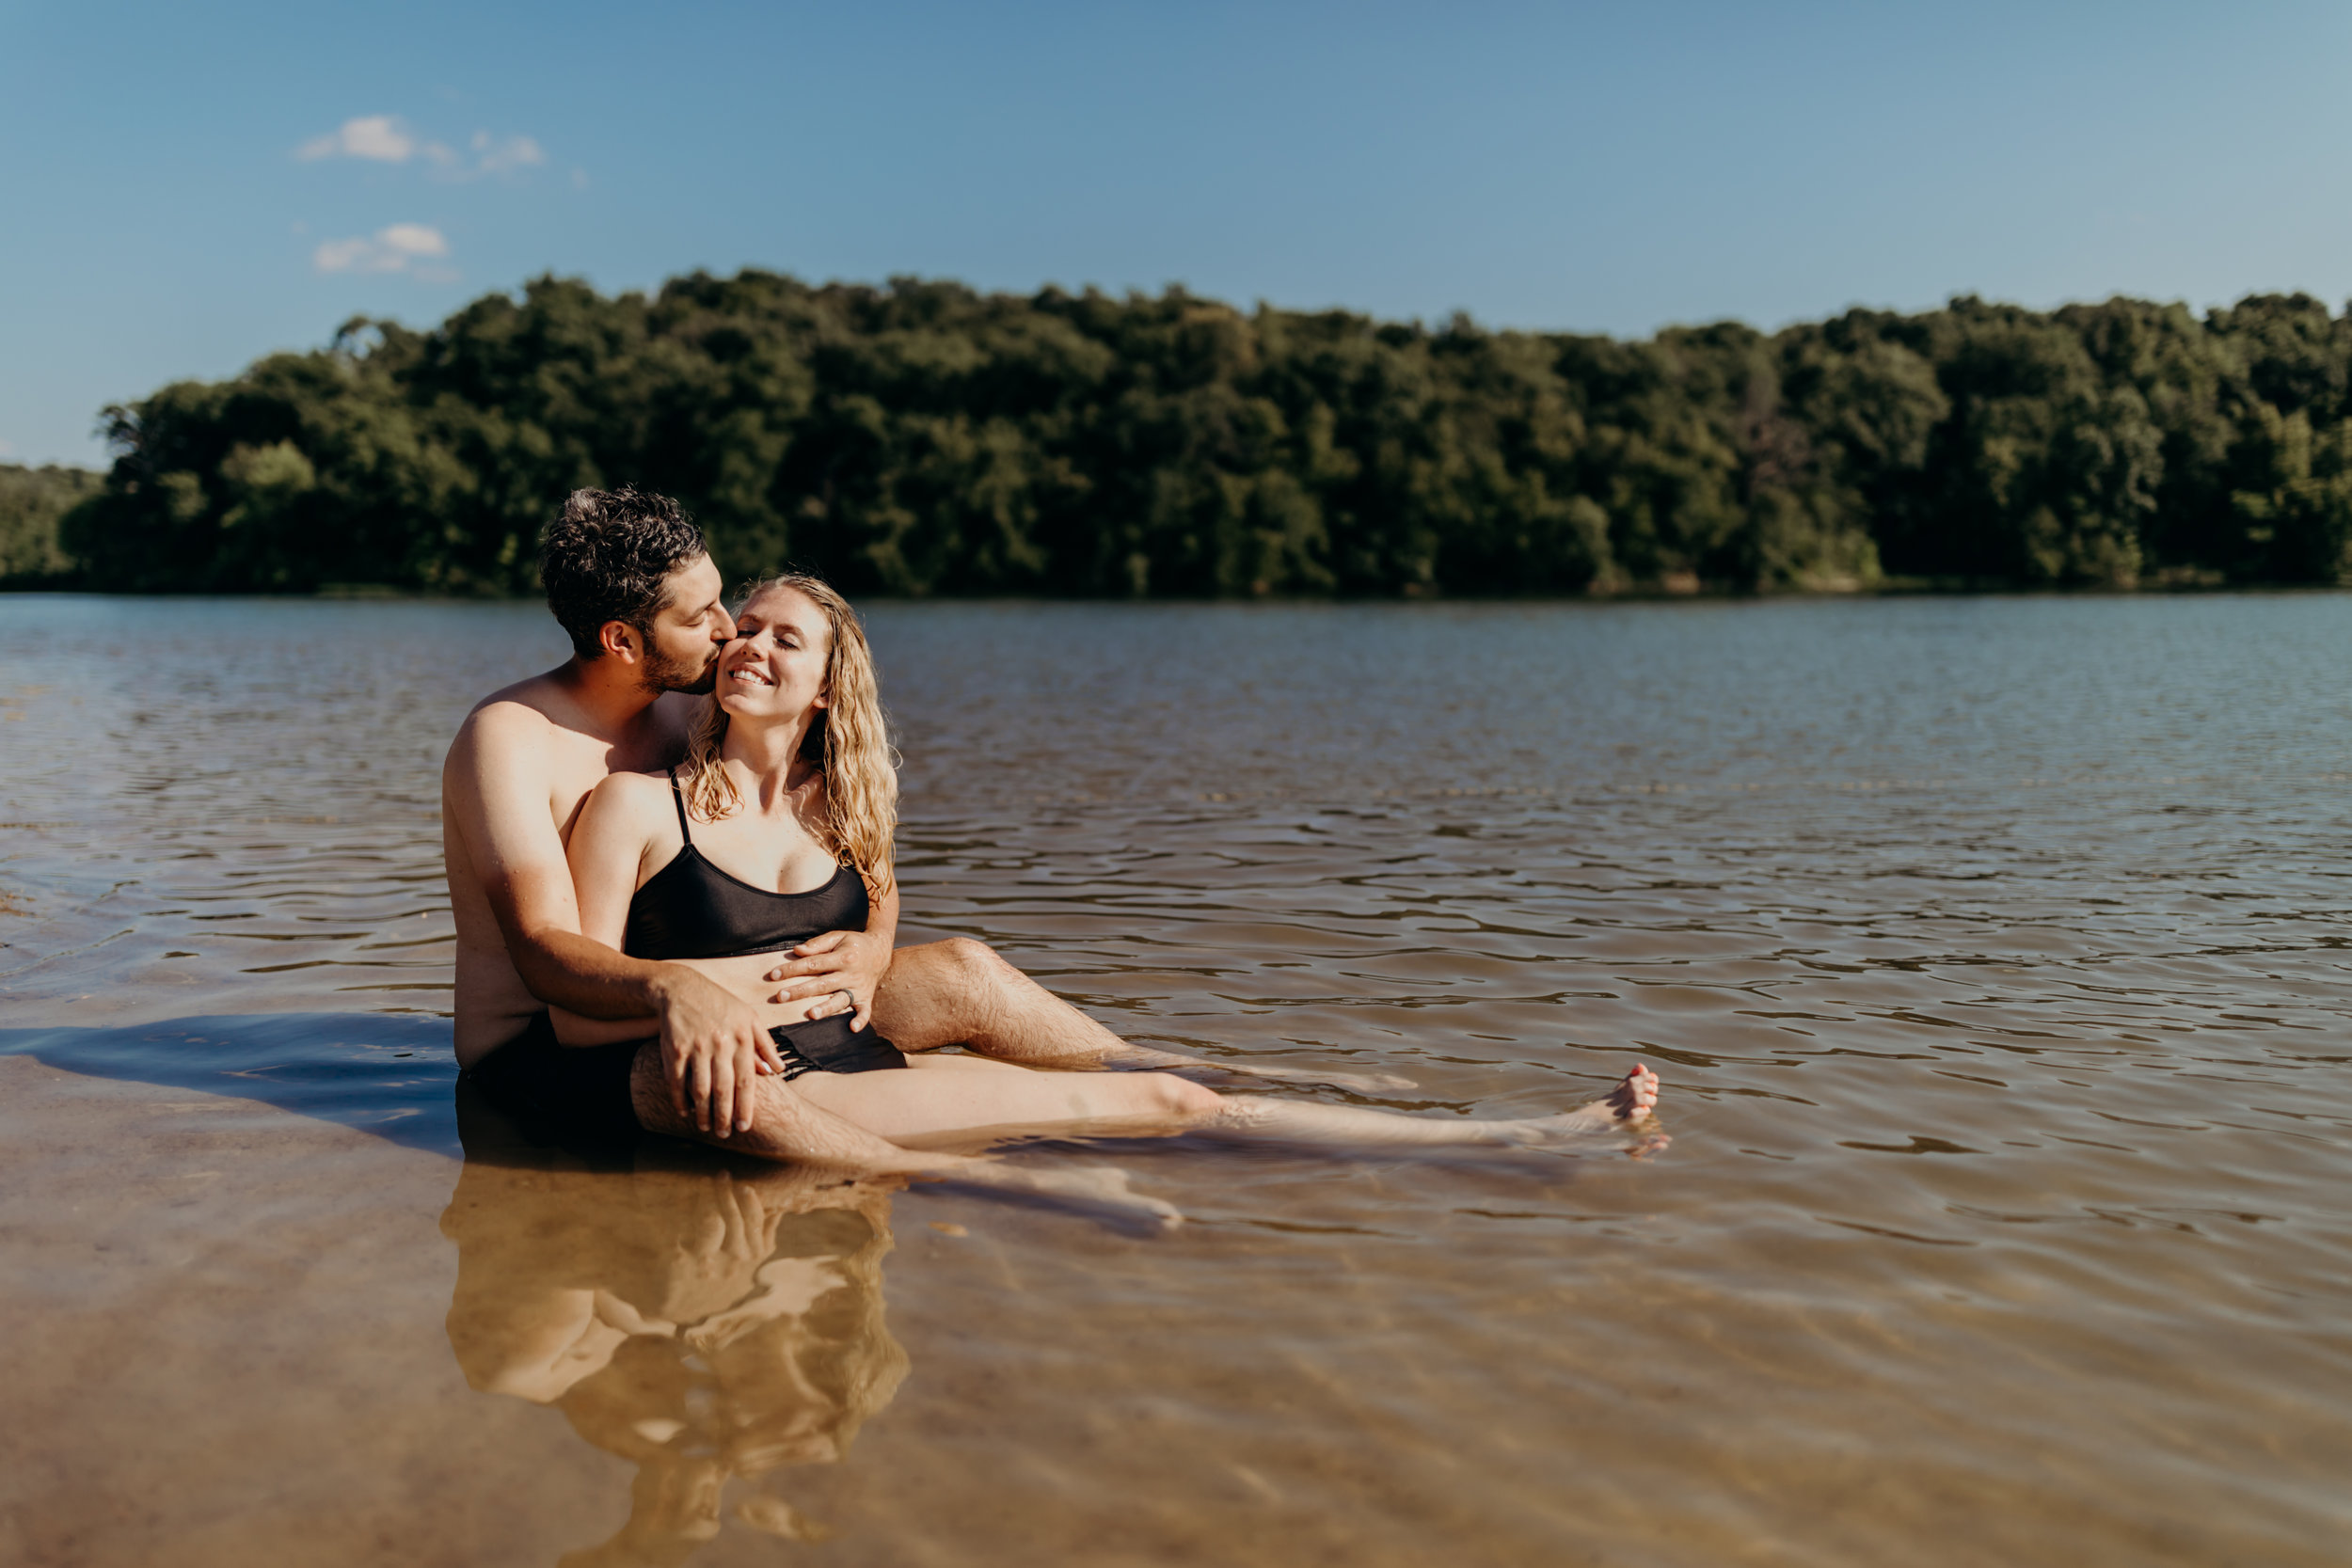 Kelsey&EvanLakeSession-40.jpg